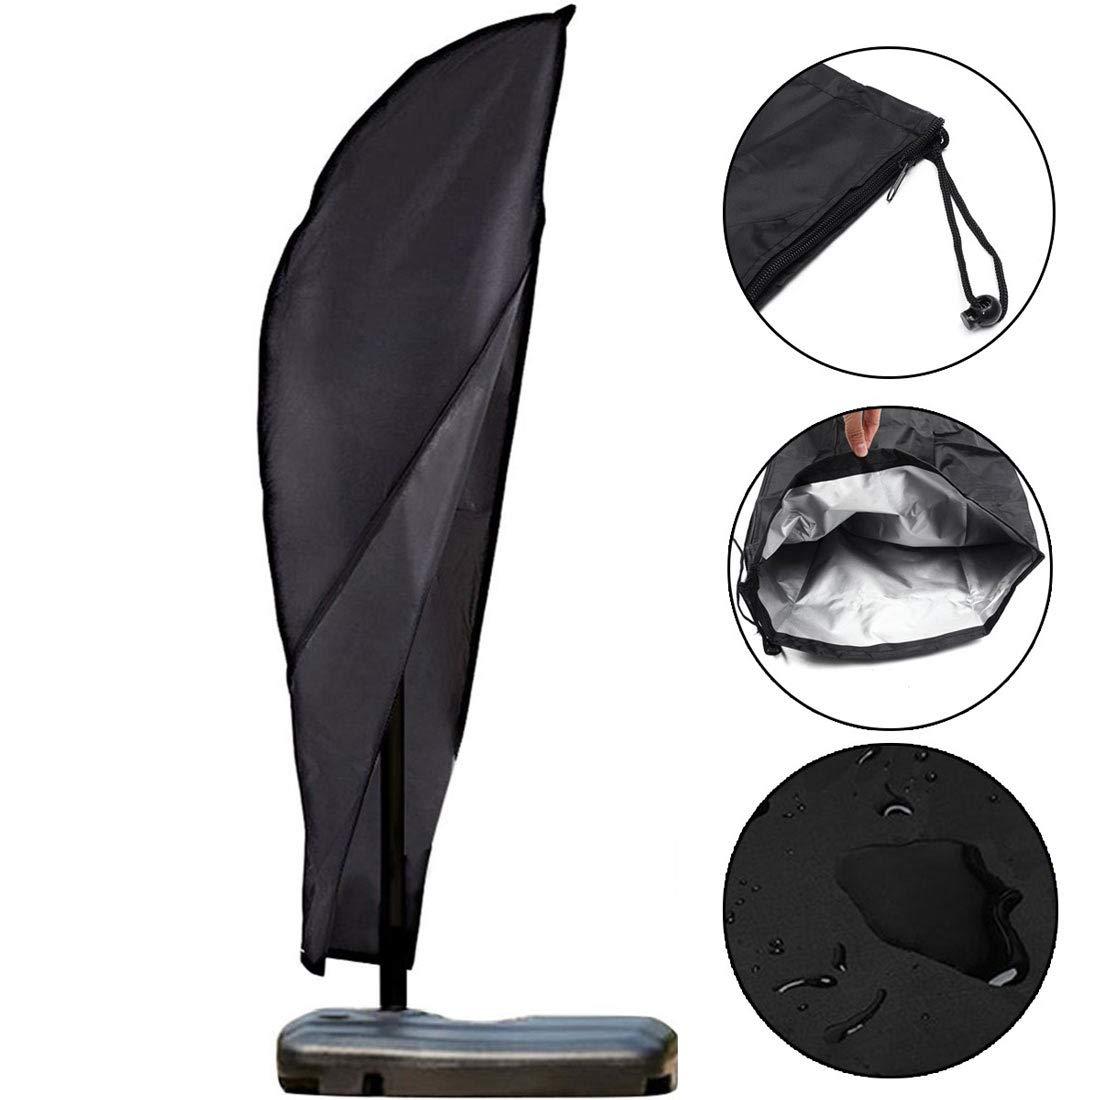 Outdoor Parasol Cover Breathable Oxford Fabric with Zipper Banana Heavy Duty Cantilever Umbrella Cover for Garden and Patio Black